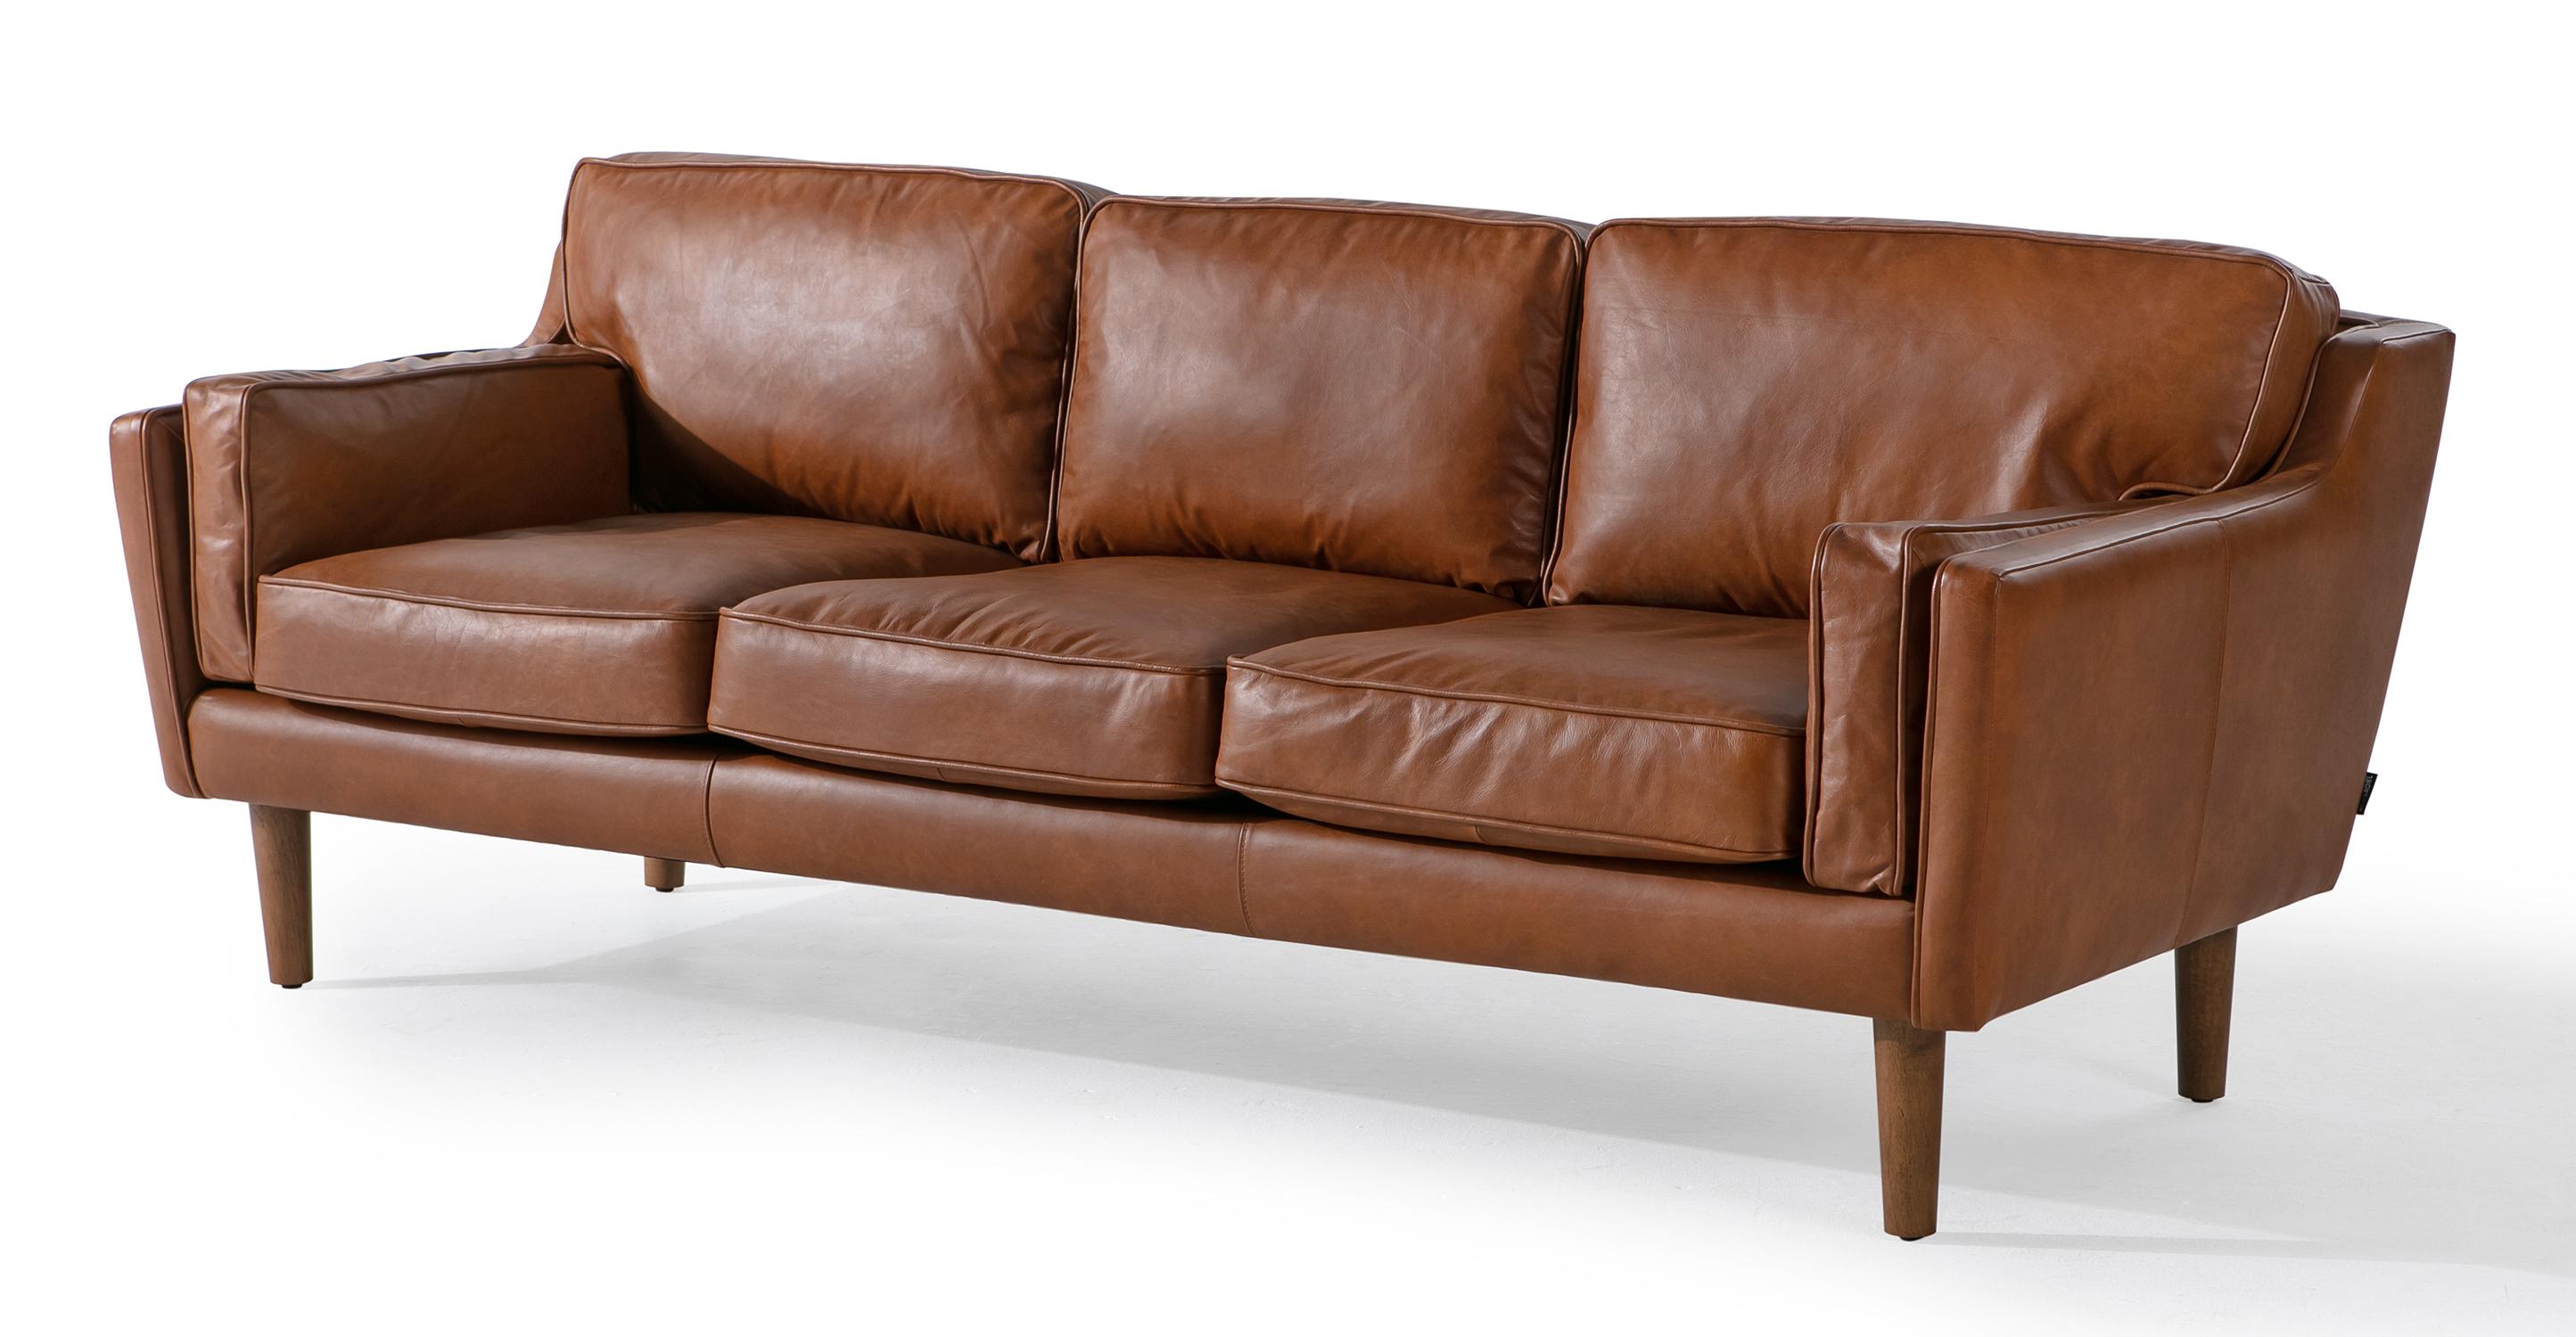 "Beatnik 86"" Leather Sofa, Napoli Spice"